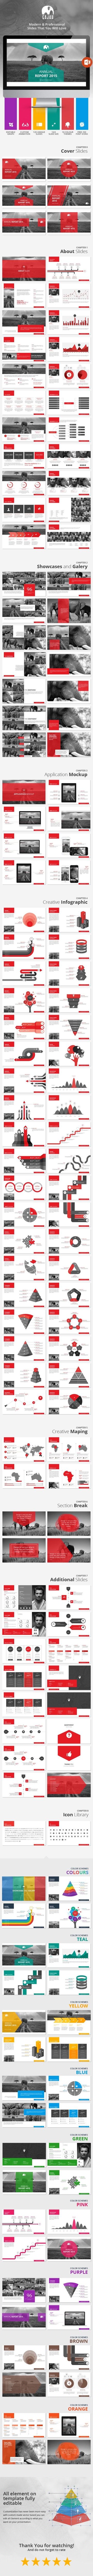 Gajah - Annual Report Powerpoint Template PowerPoint Template / Theme / Presentation / Slides / Background / Power Point #powerpoint #template #theme